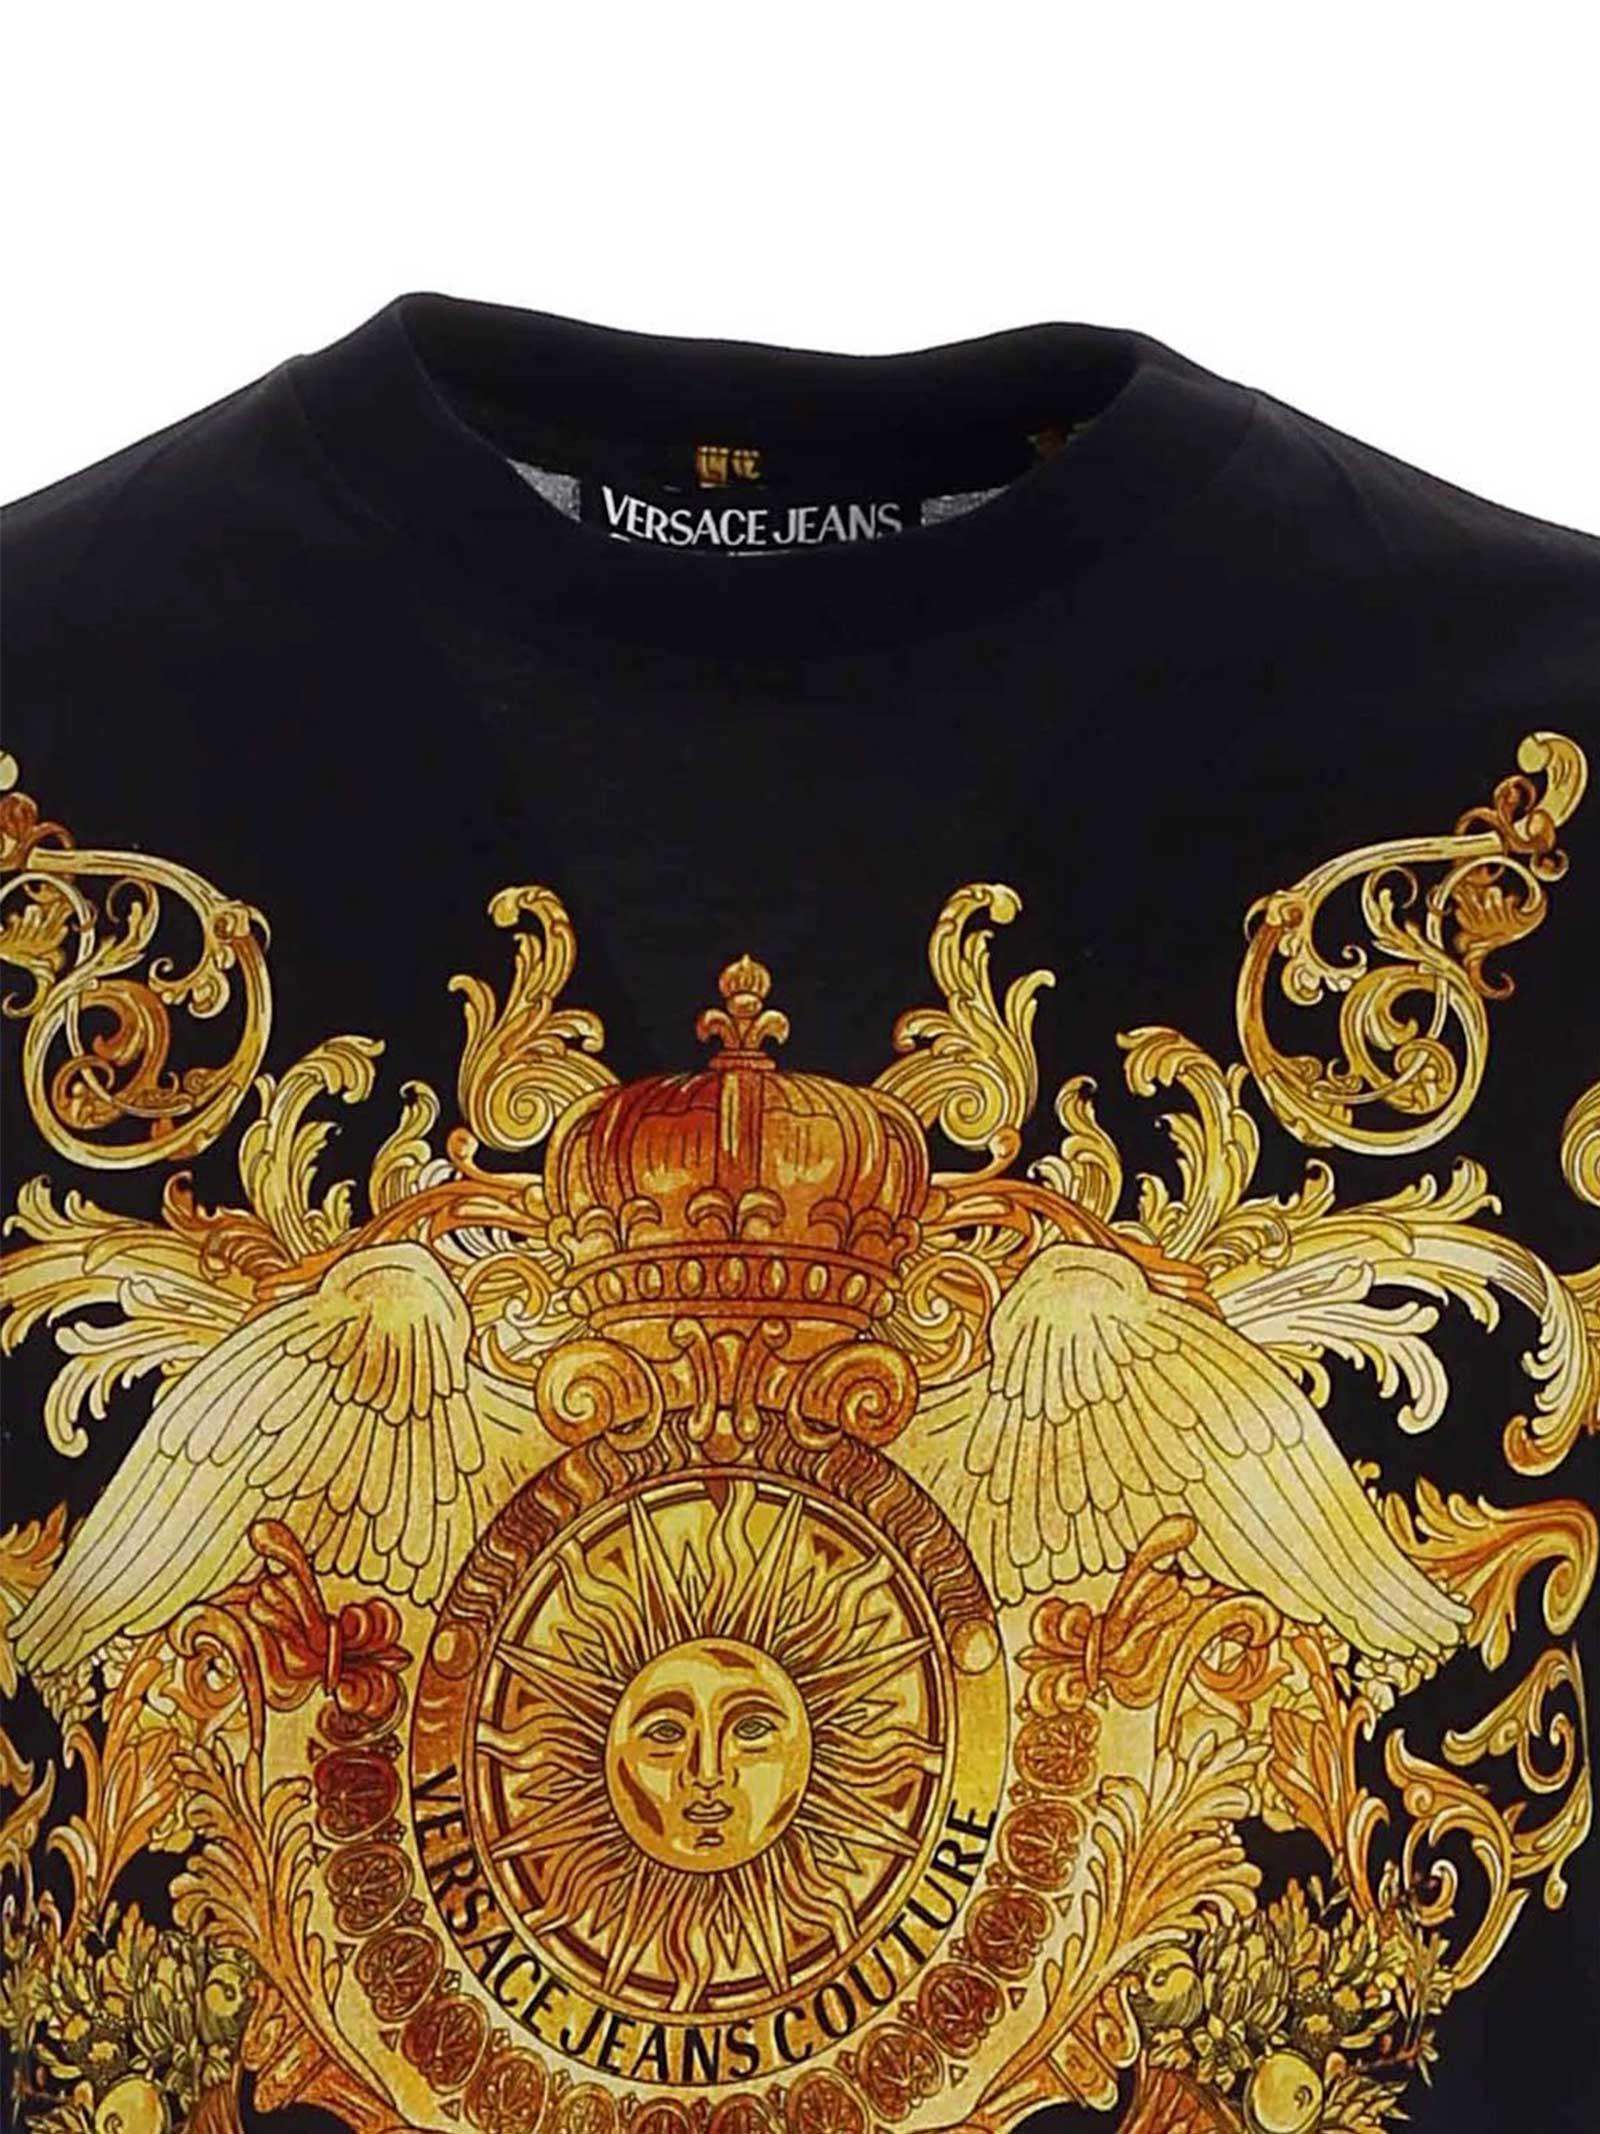 VERSACE JEANS | T-shirt | B3 GWA7S1S0274 899